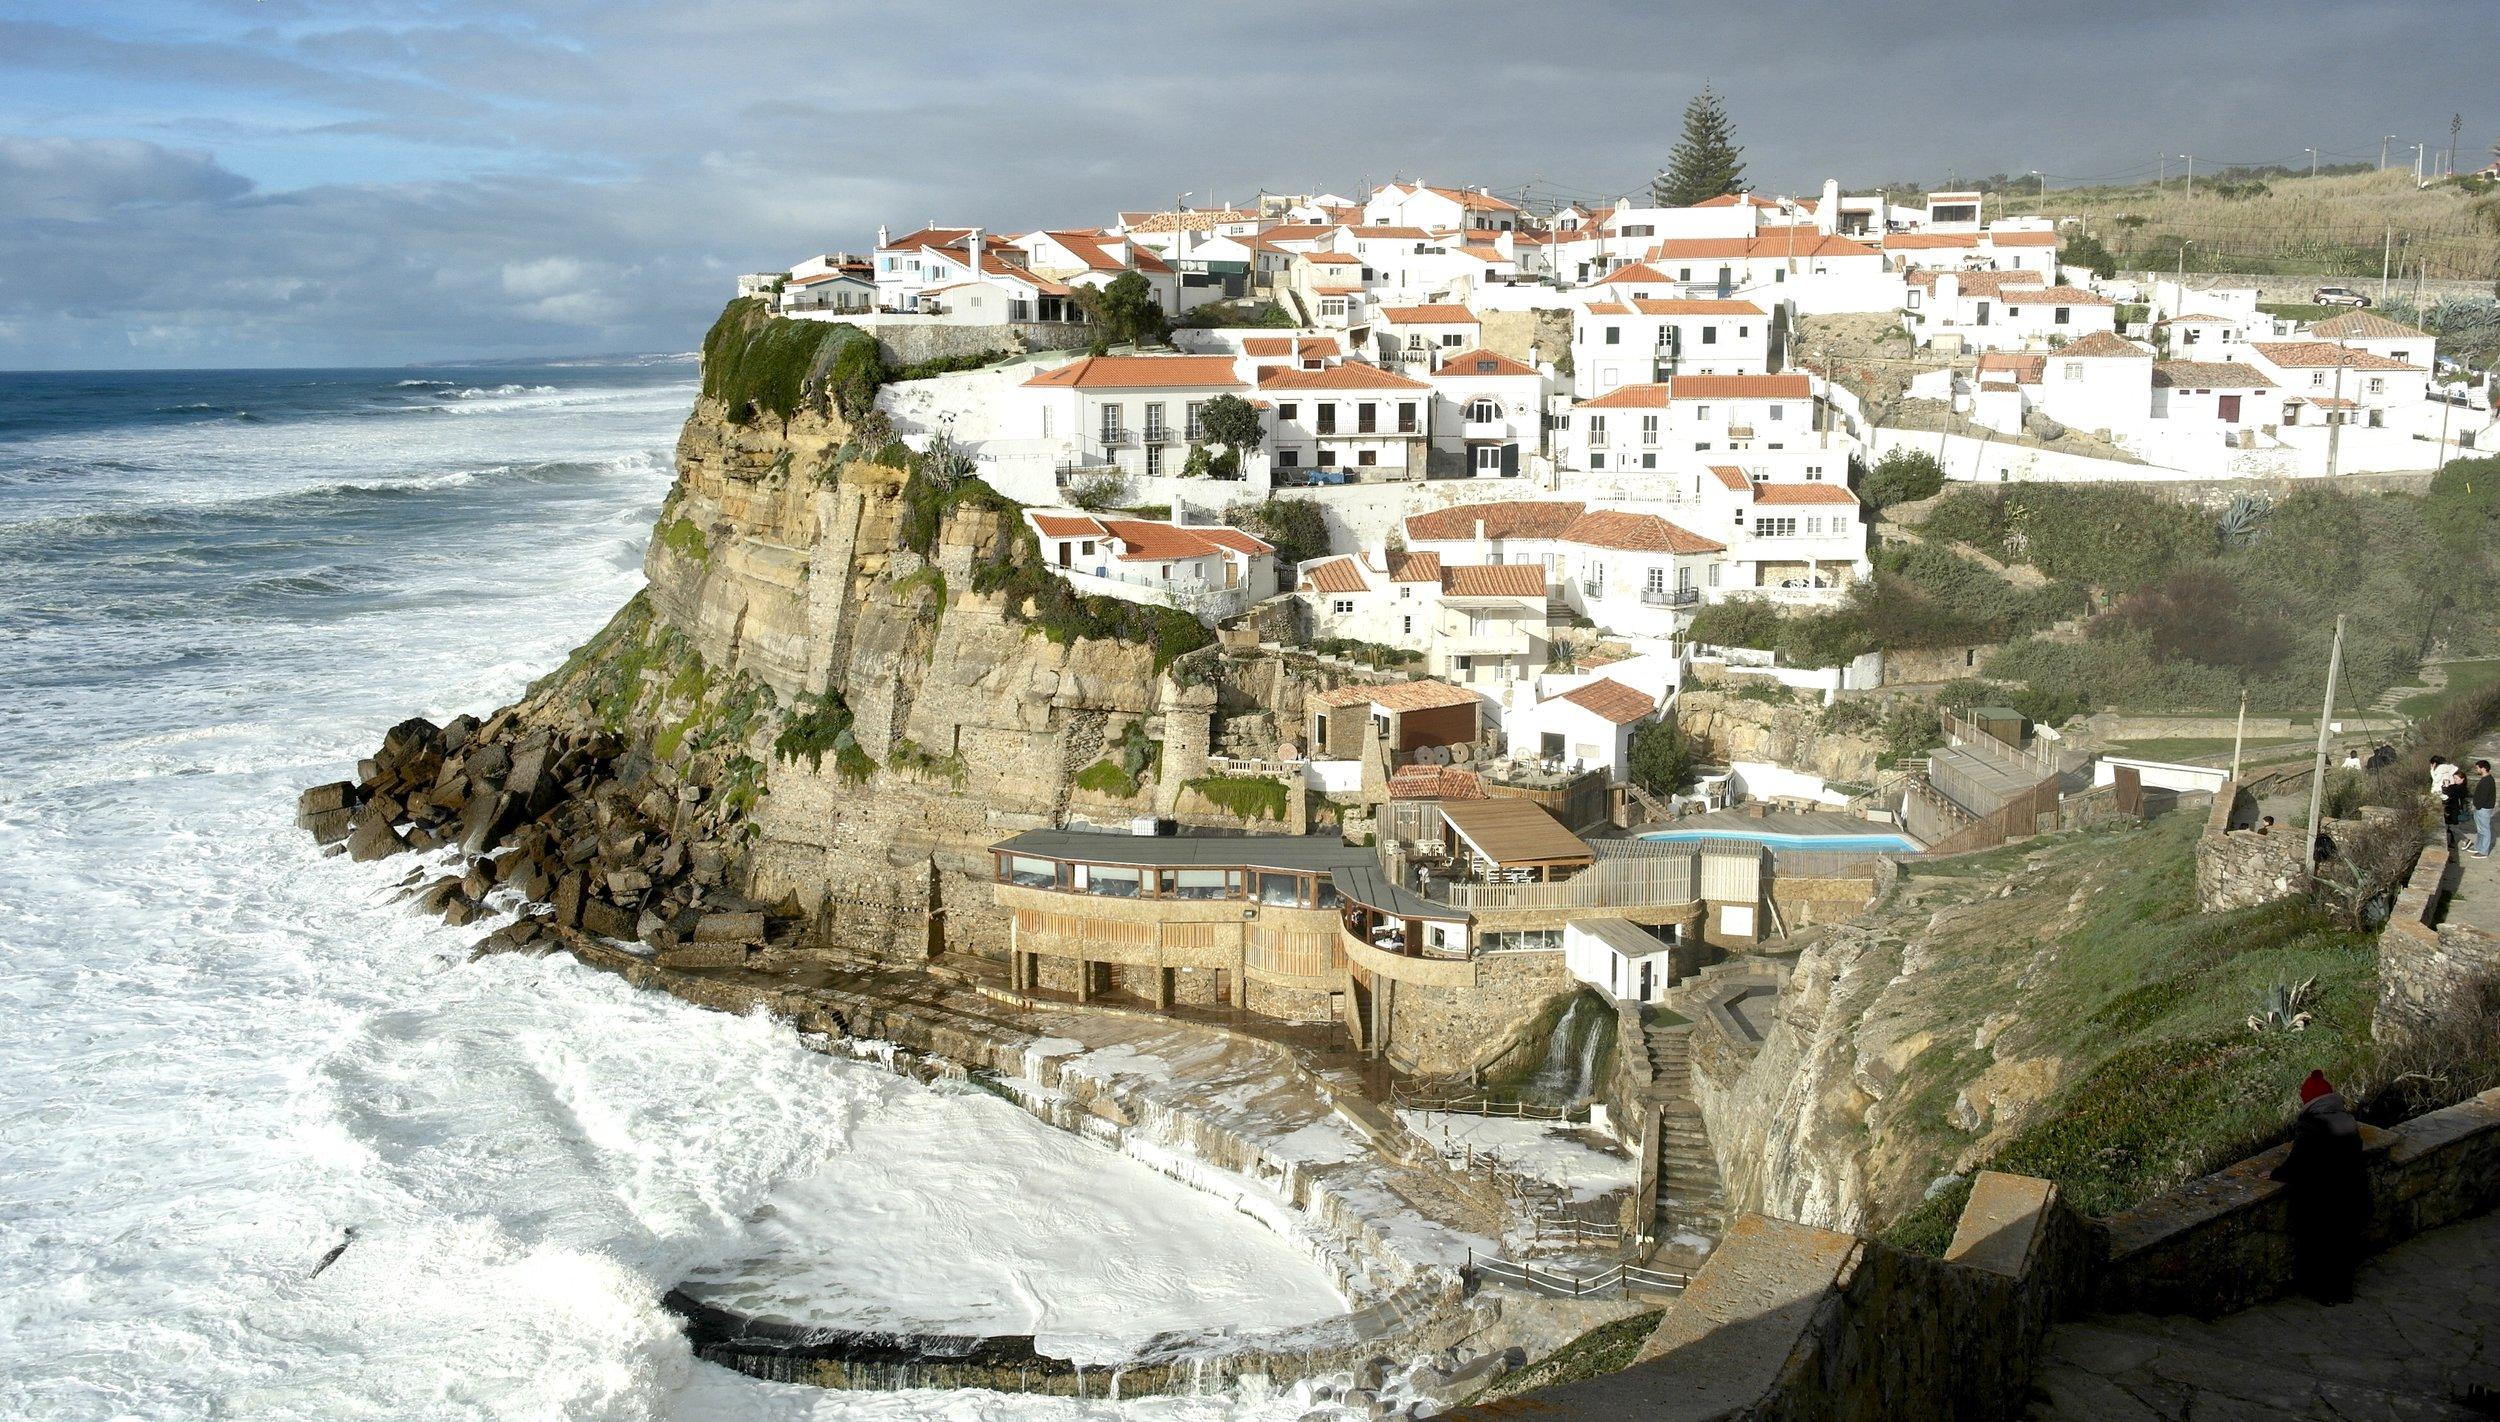 Town perched on a cliff: Azhenas do Mar